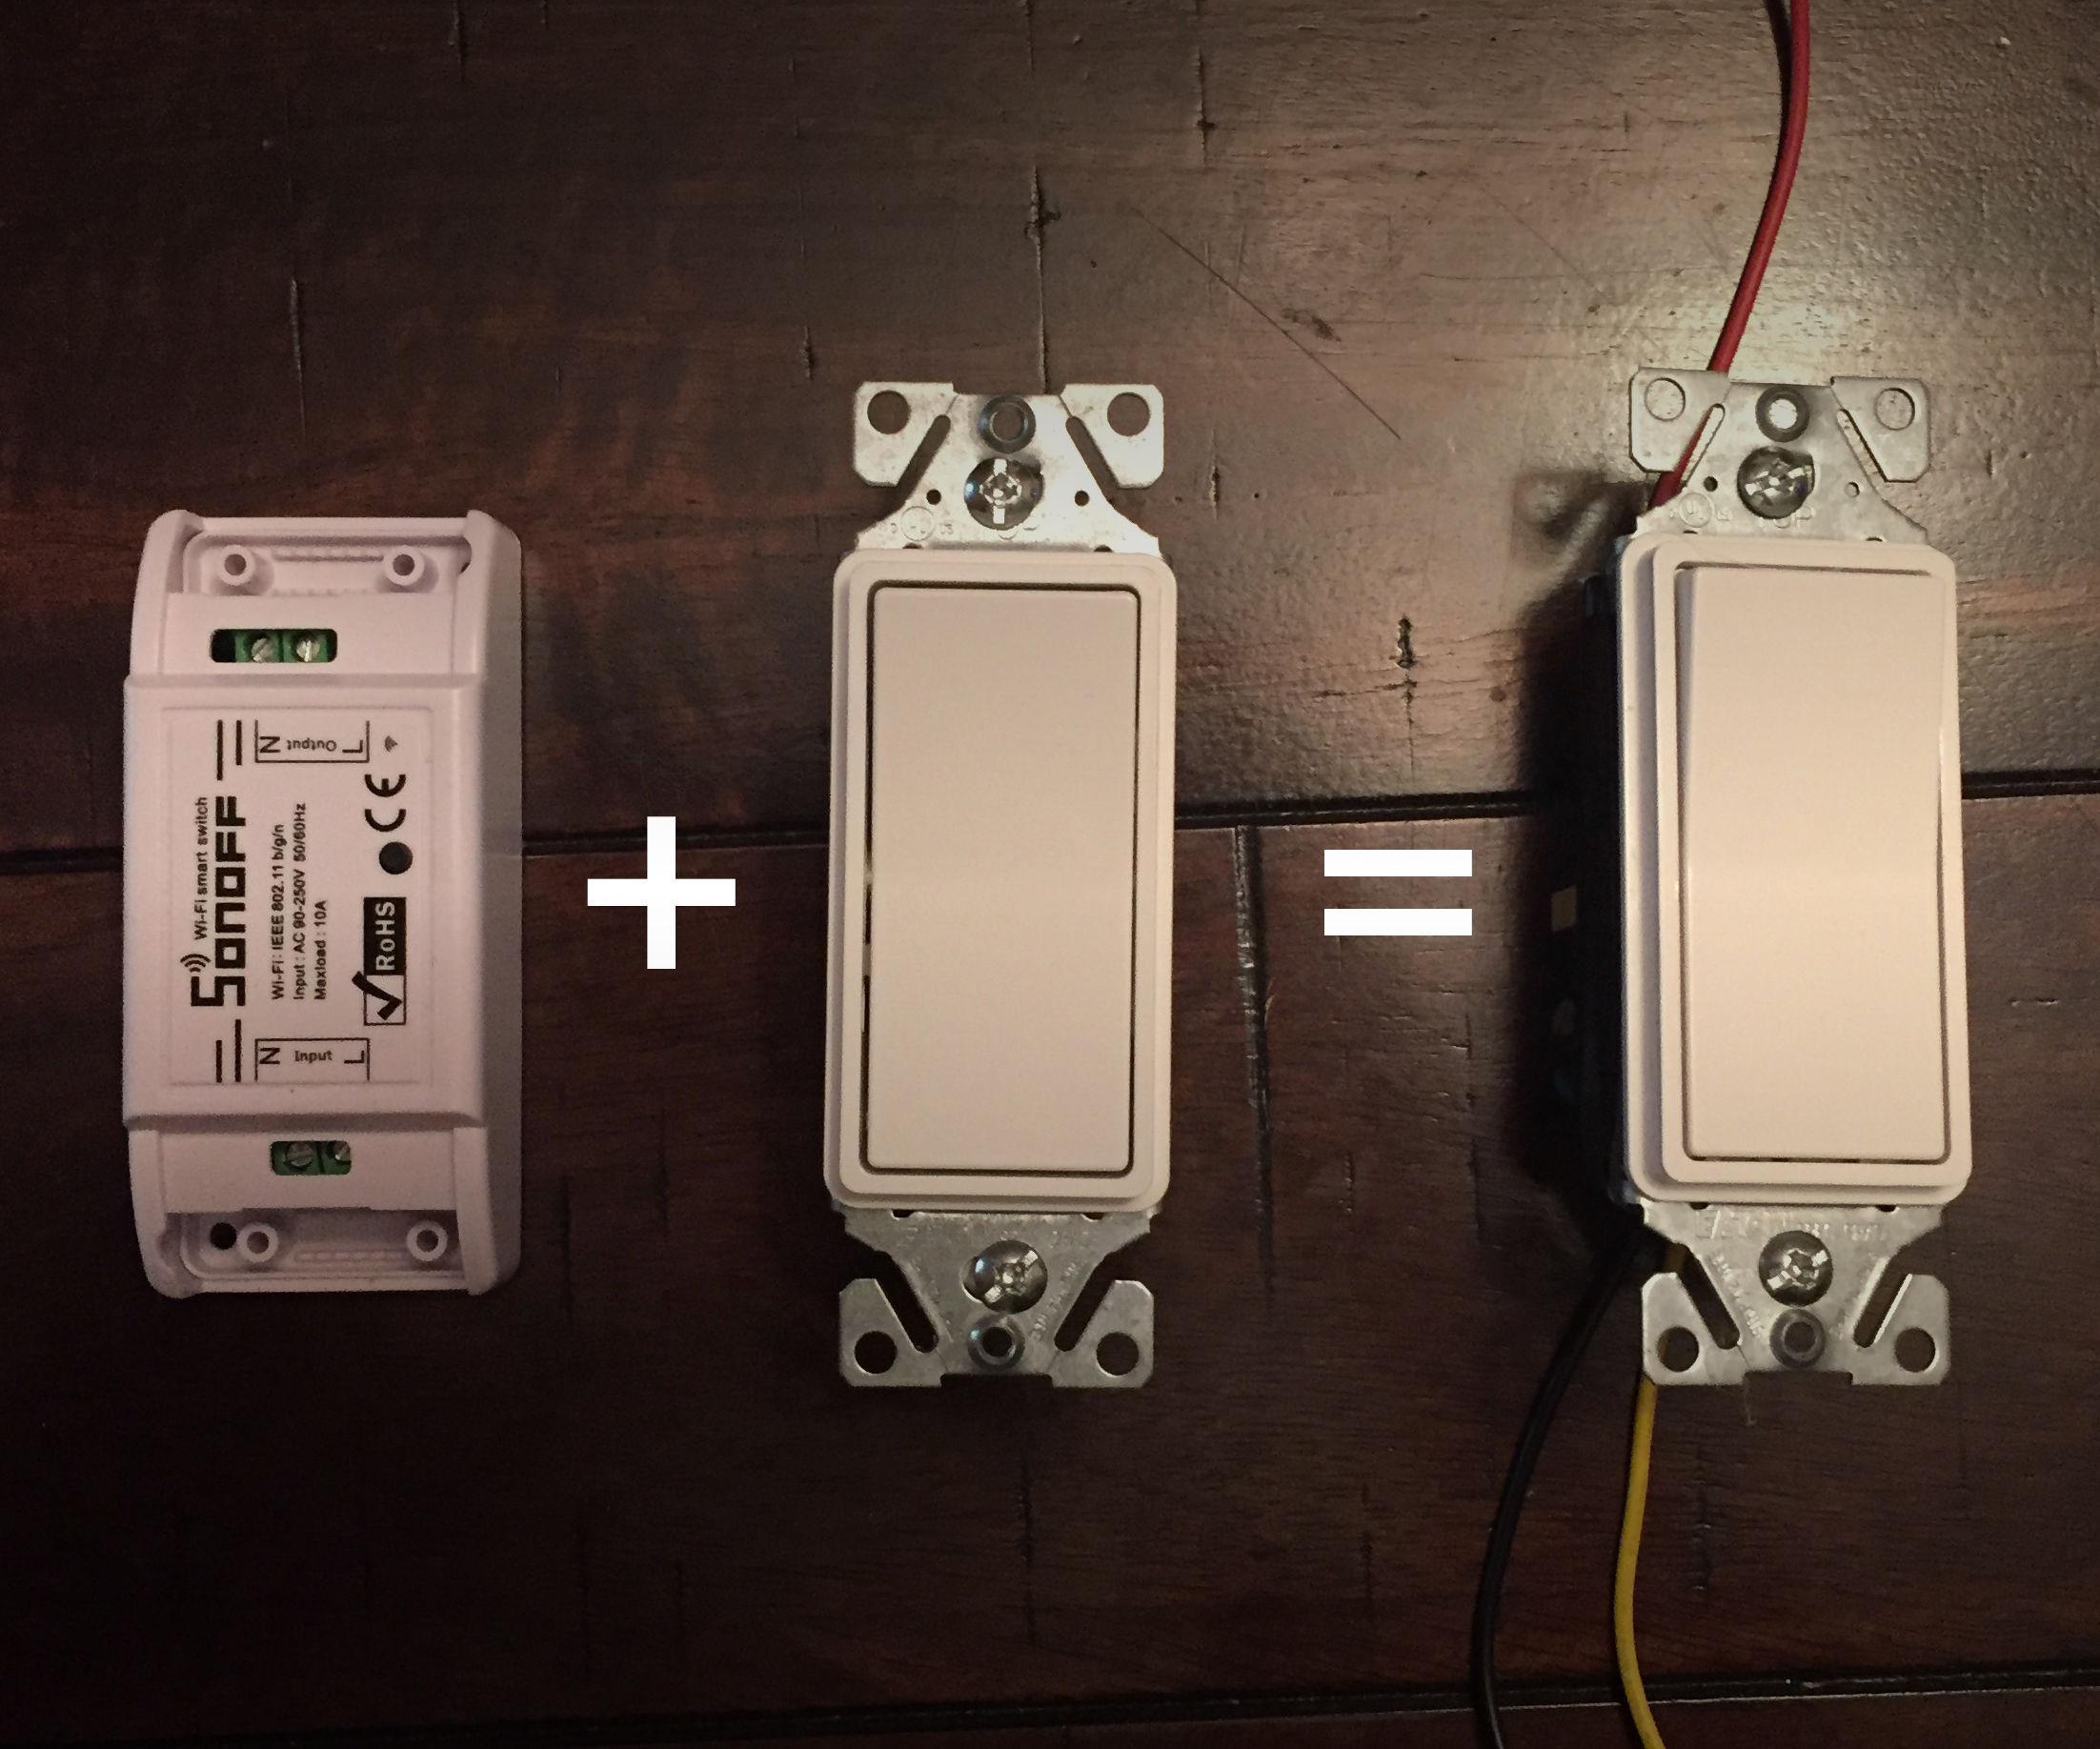 DIY Hybrid Sonoff Smart Switch for $10